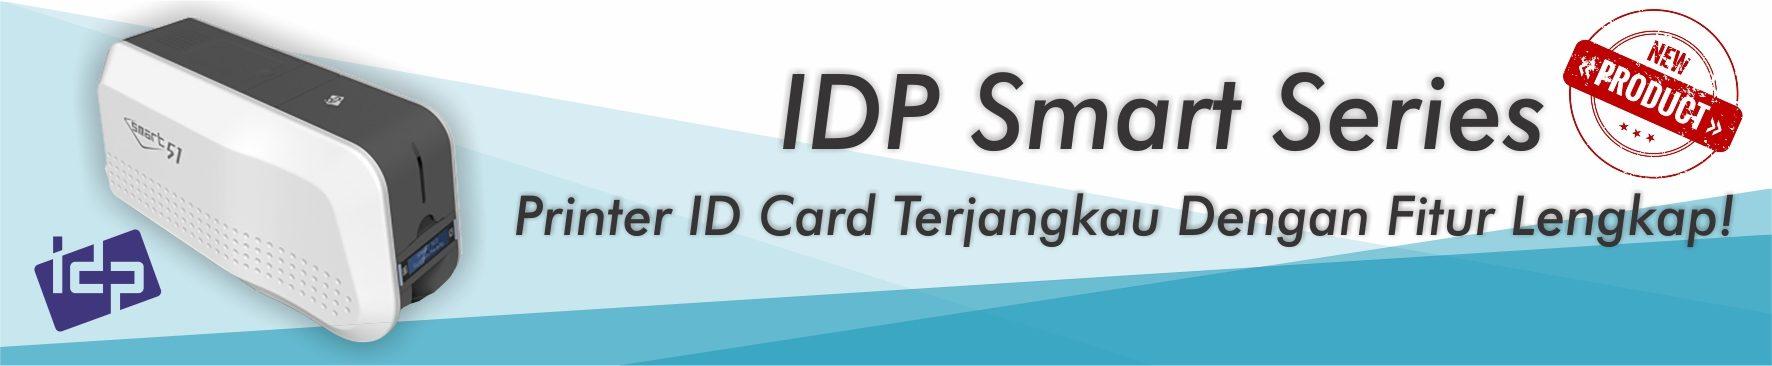 Printer IDP Smart